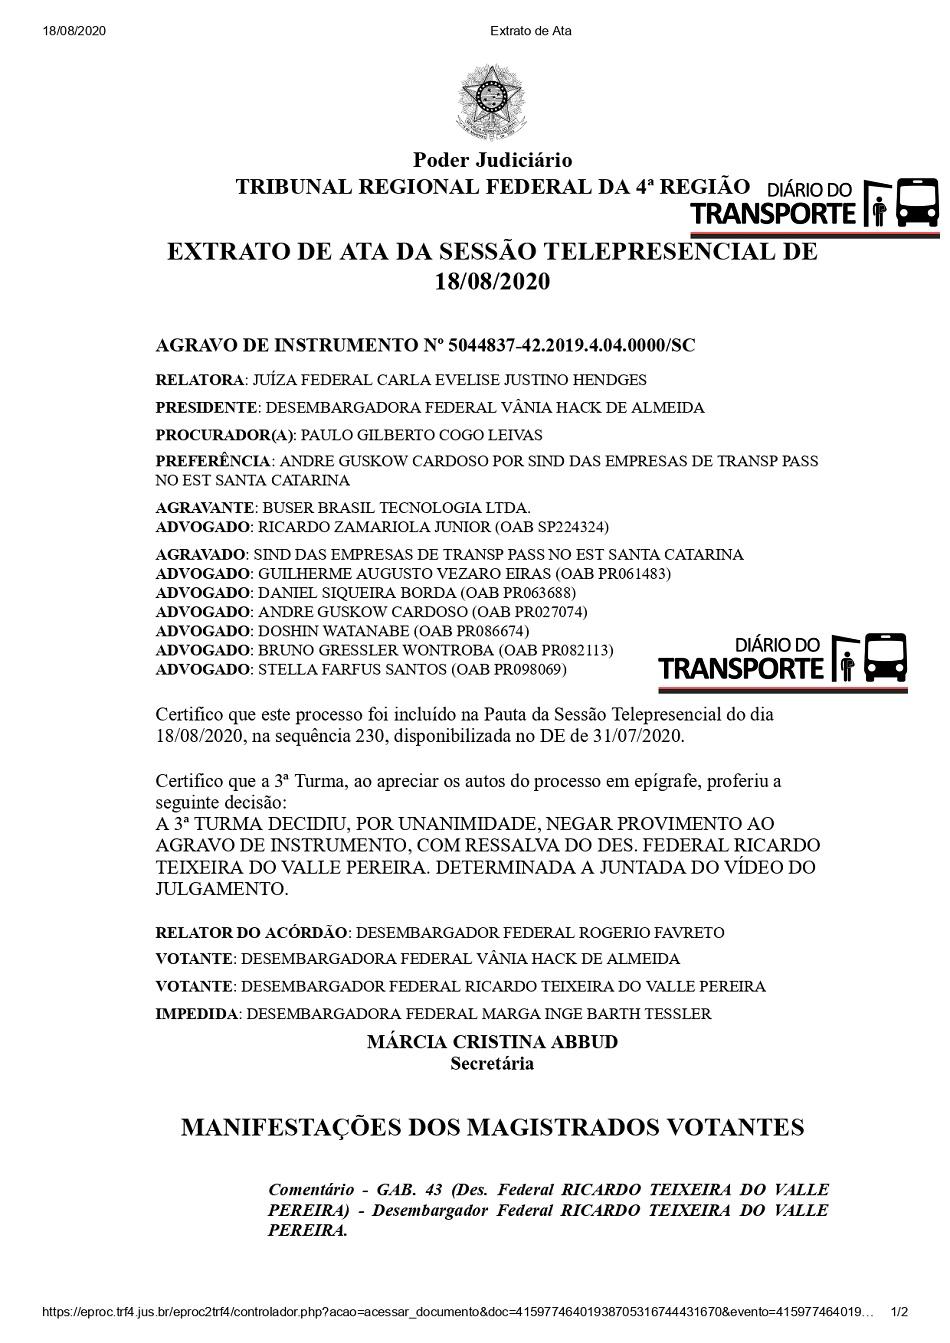 Evento 70 - EXTRATOATA1 (1)_page-0001